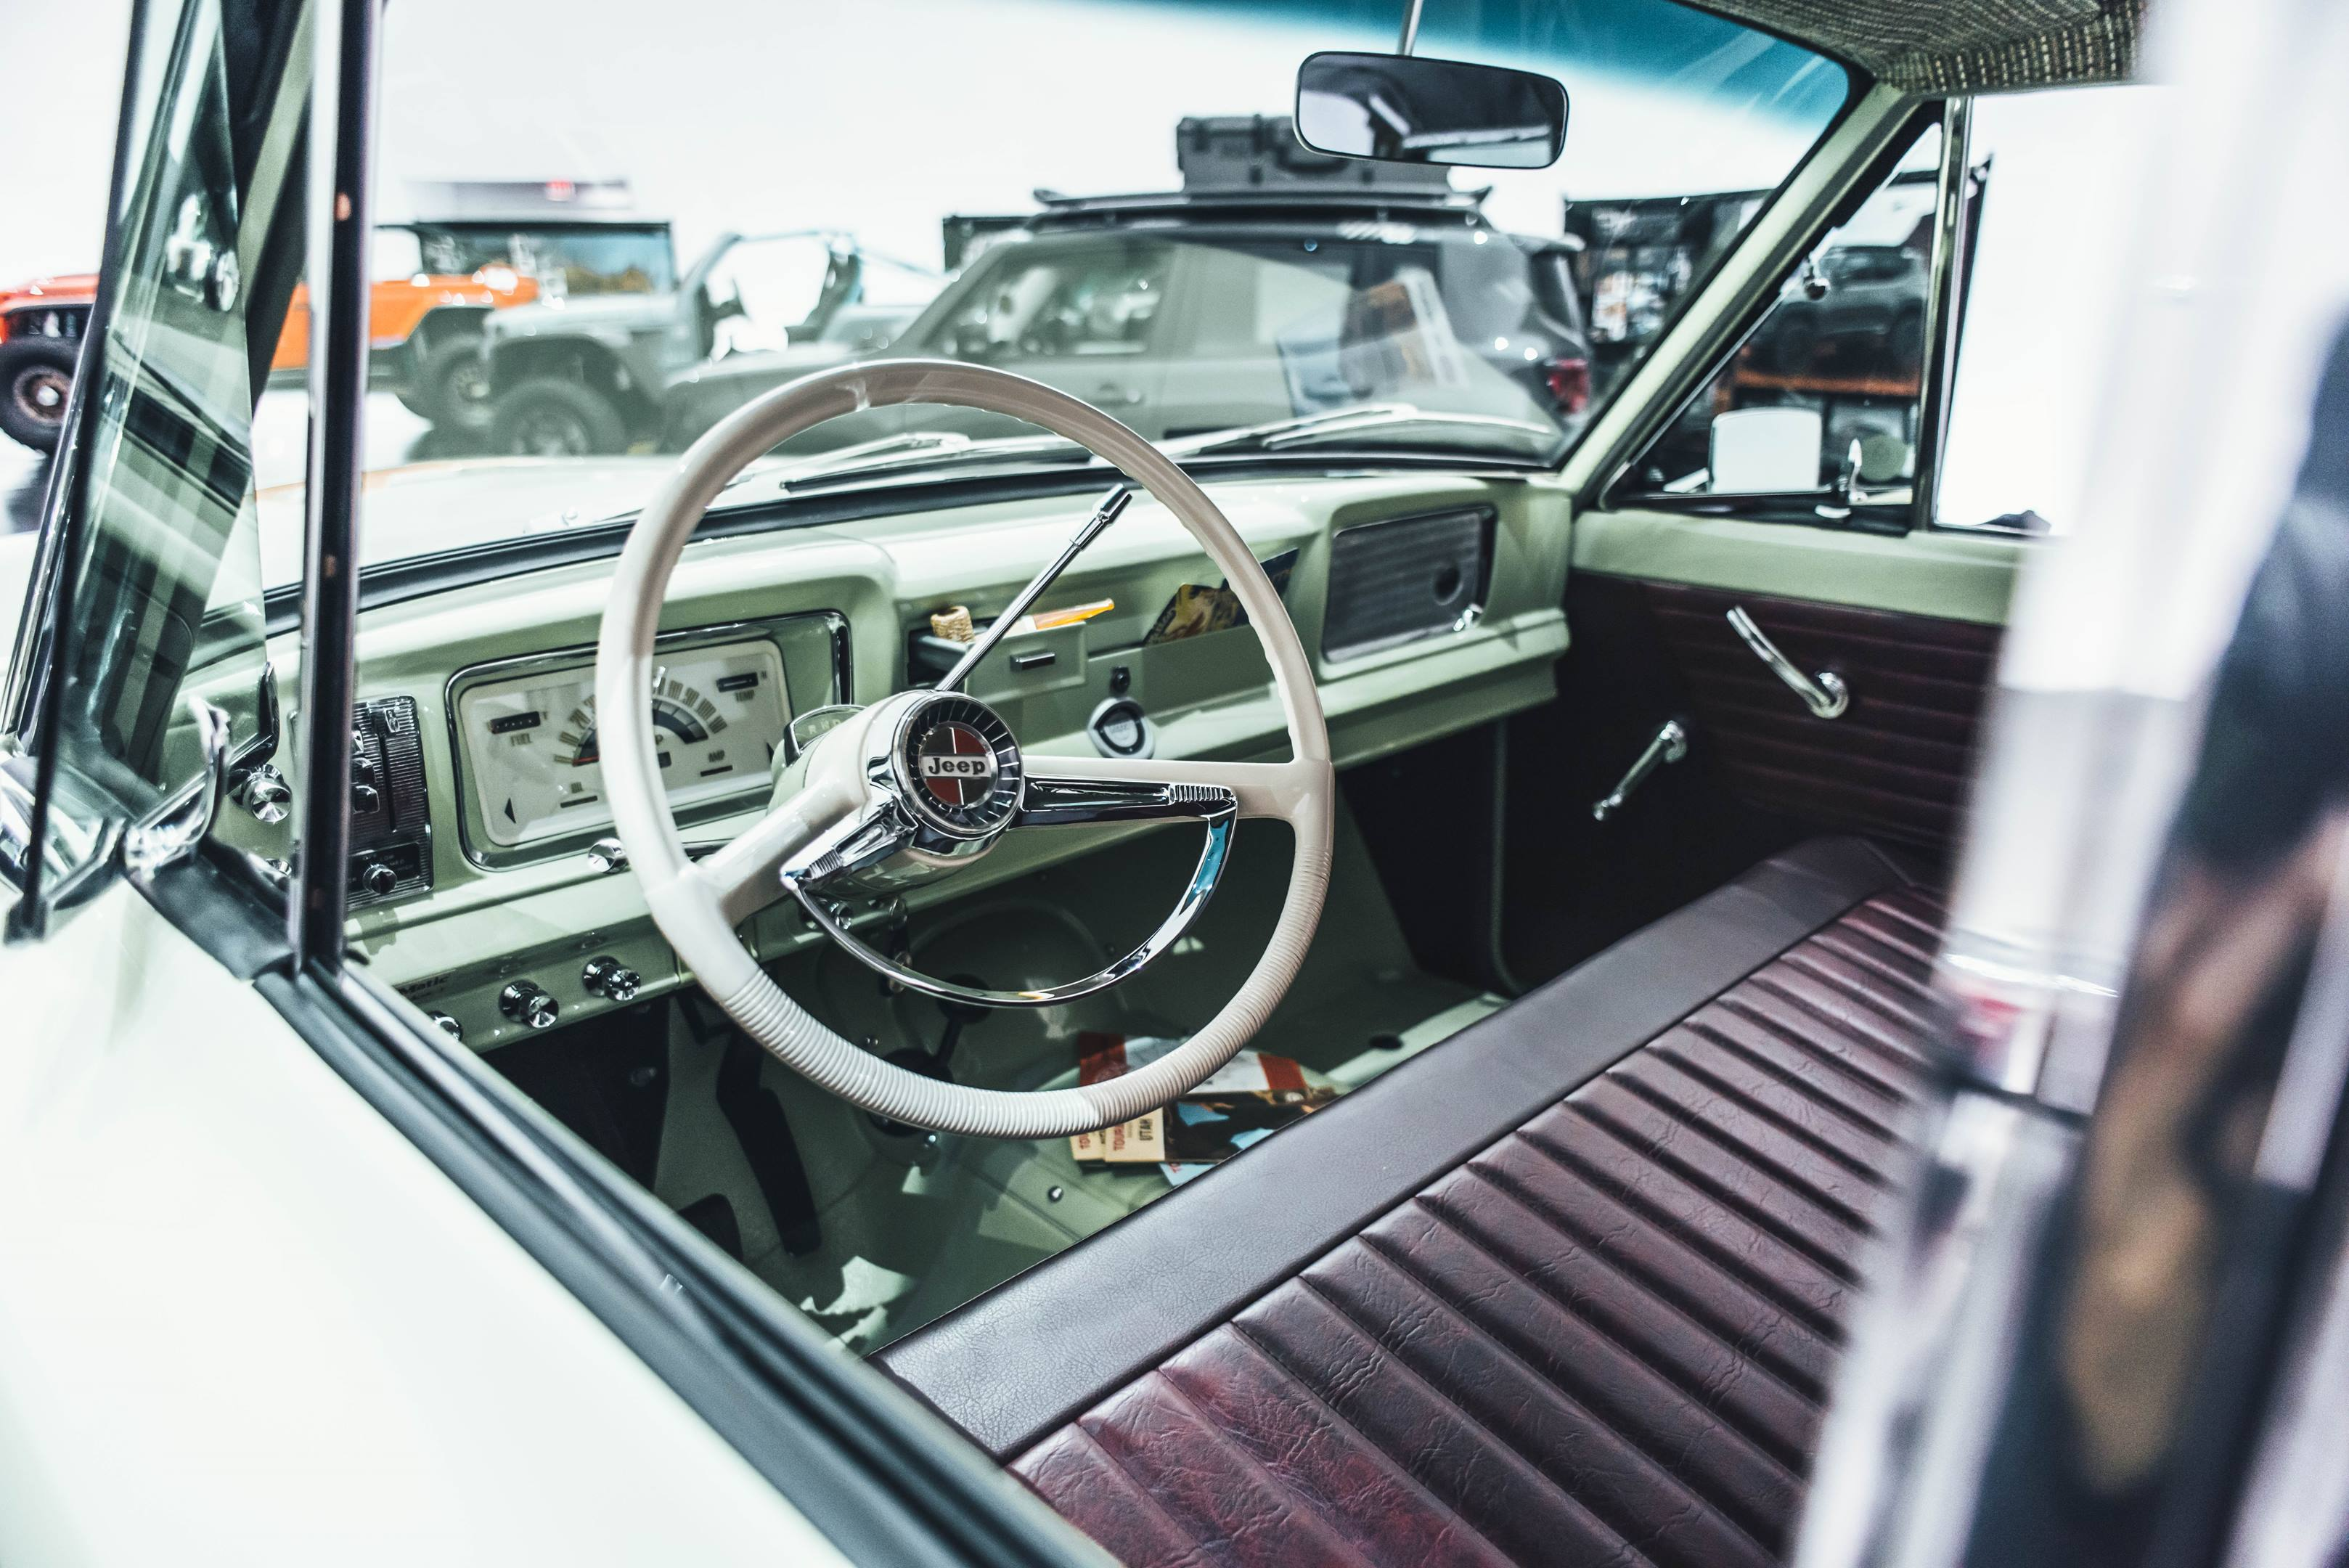 2018 Jeep Wagoneer Roadtrip Concept interior